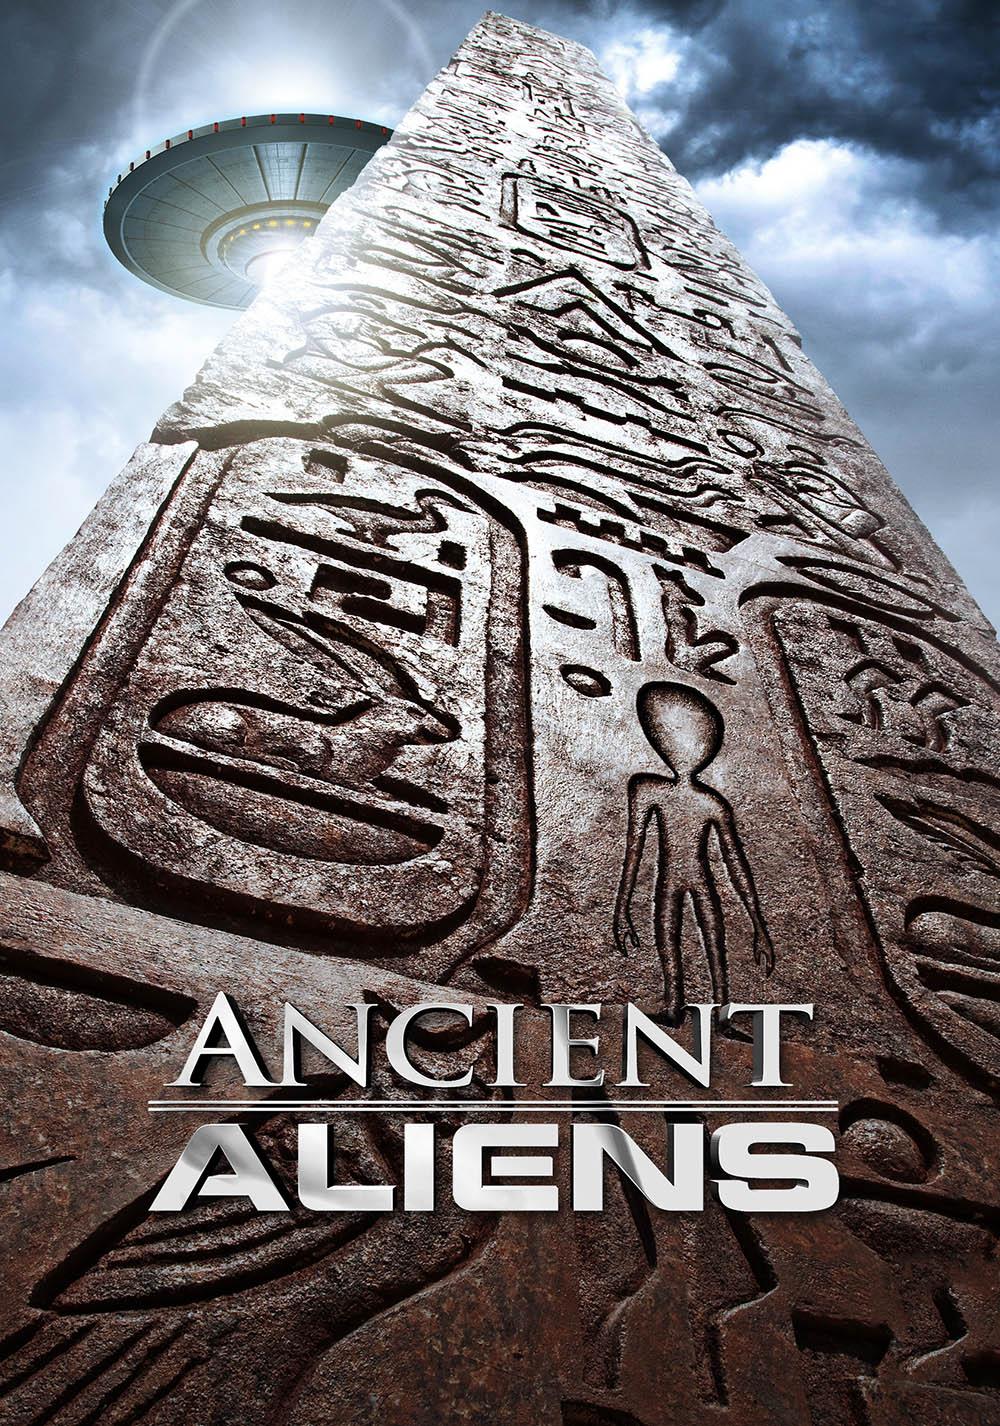 Ancient Aliens (2009) | TV fanart | fanart.tv  Ancient Aliens ...